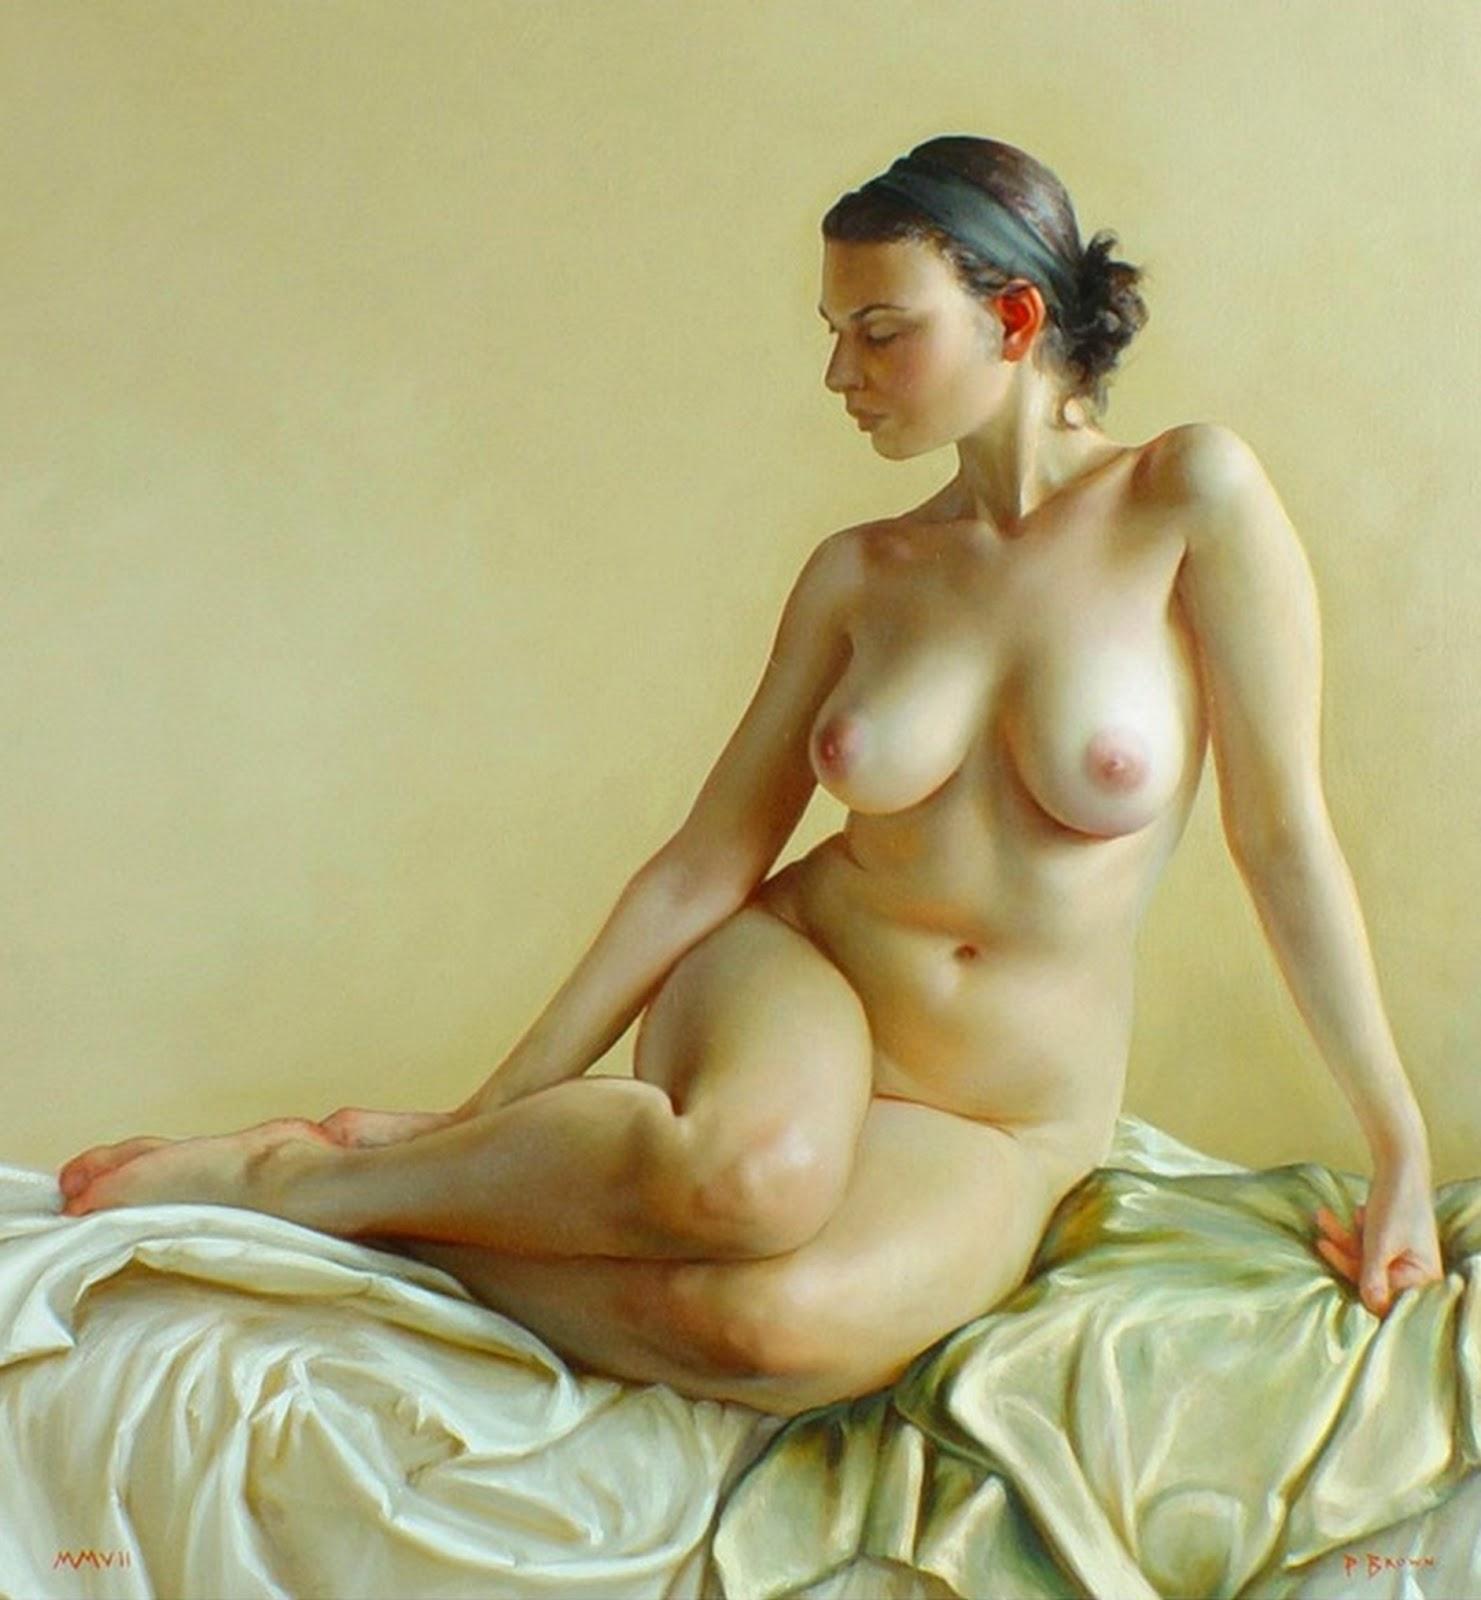 Los Desnudos Femeninos